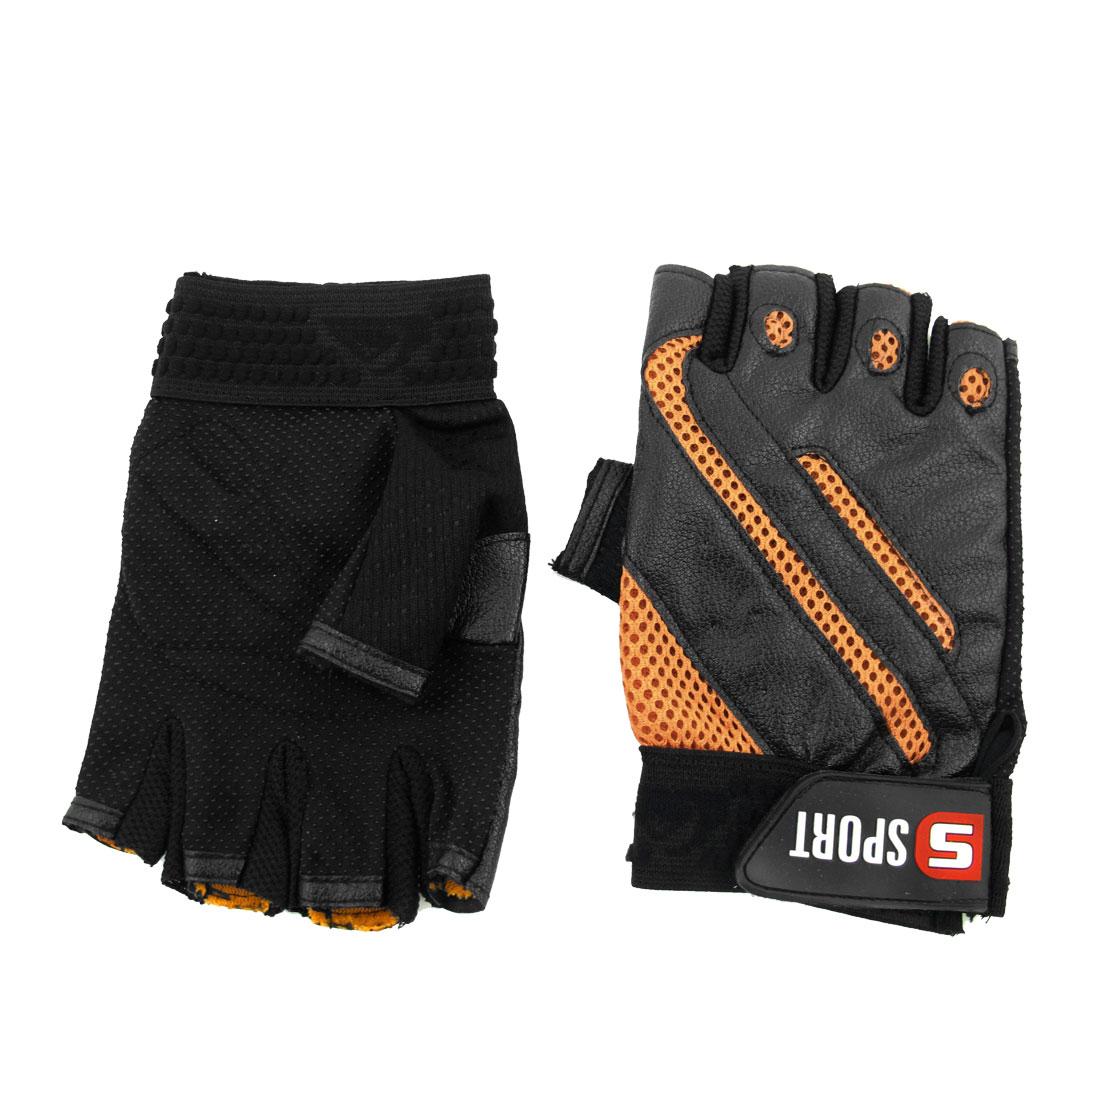 Man Hook Loop Closure Antislip Half Finger Sports Gloves Orange Black Pair